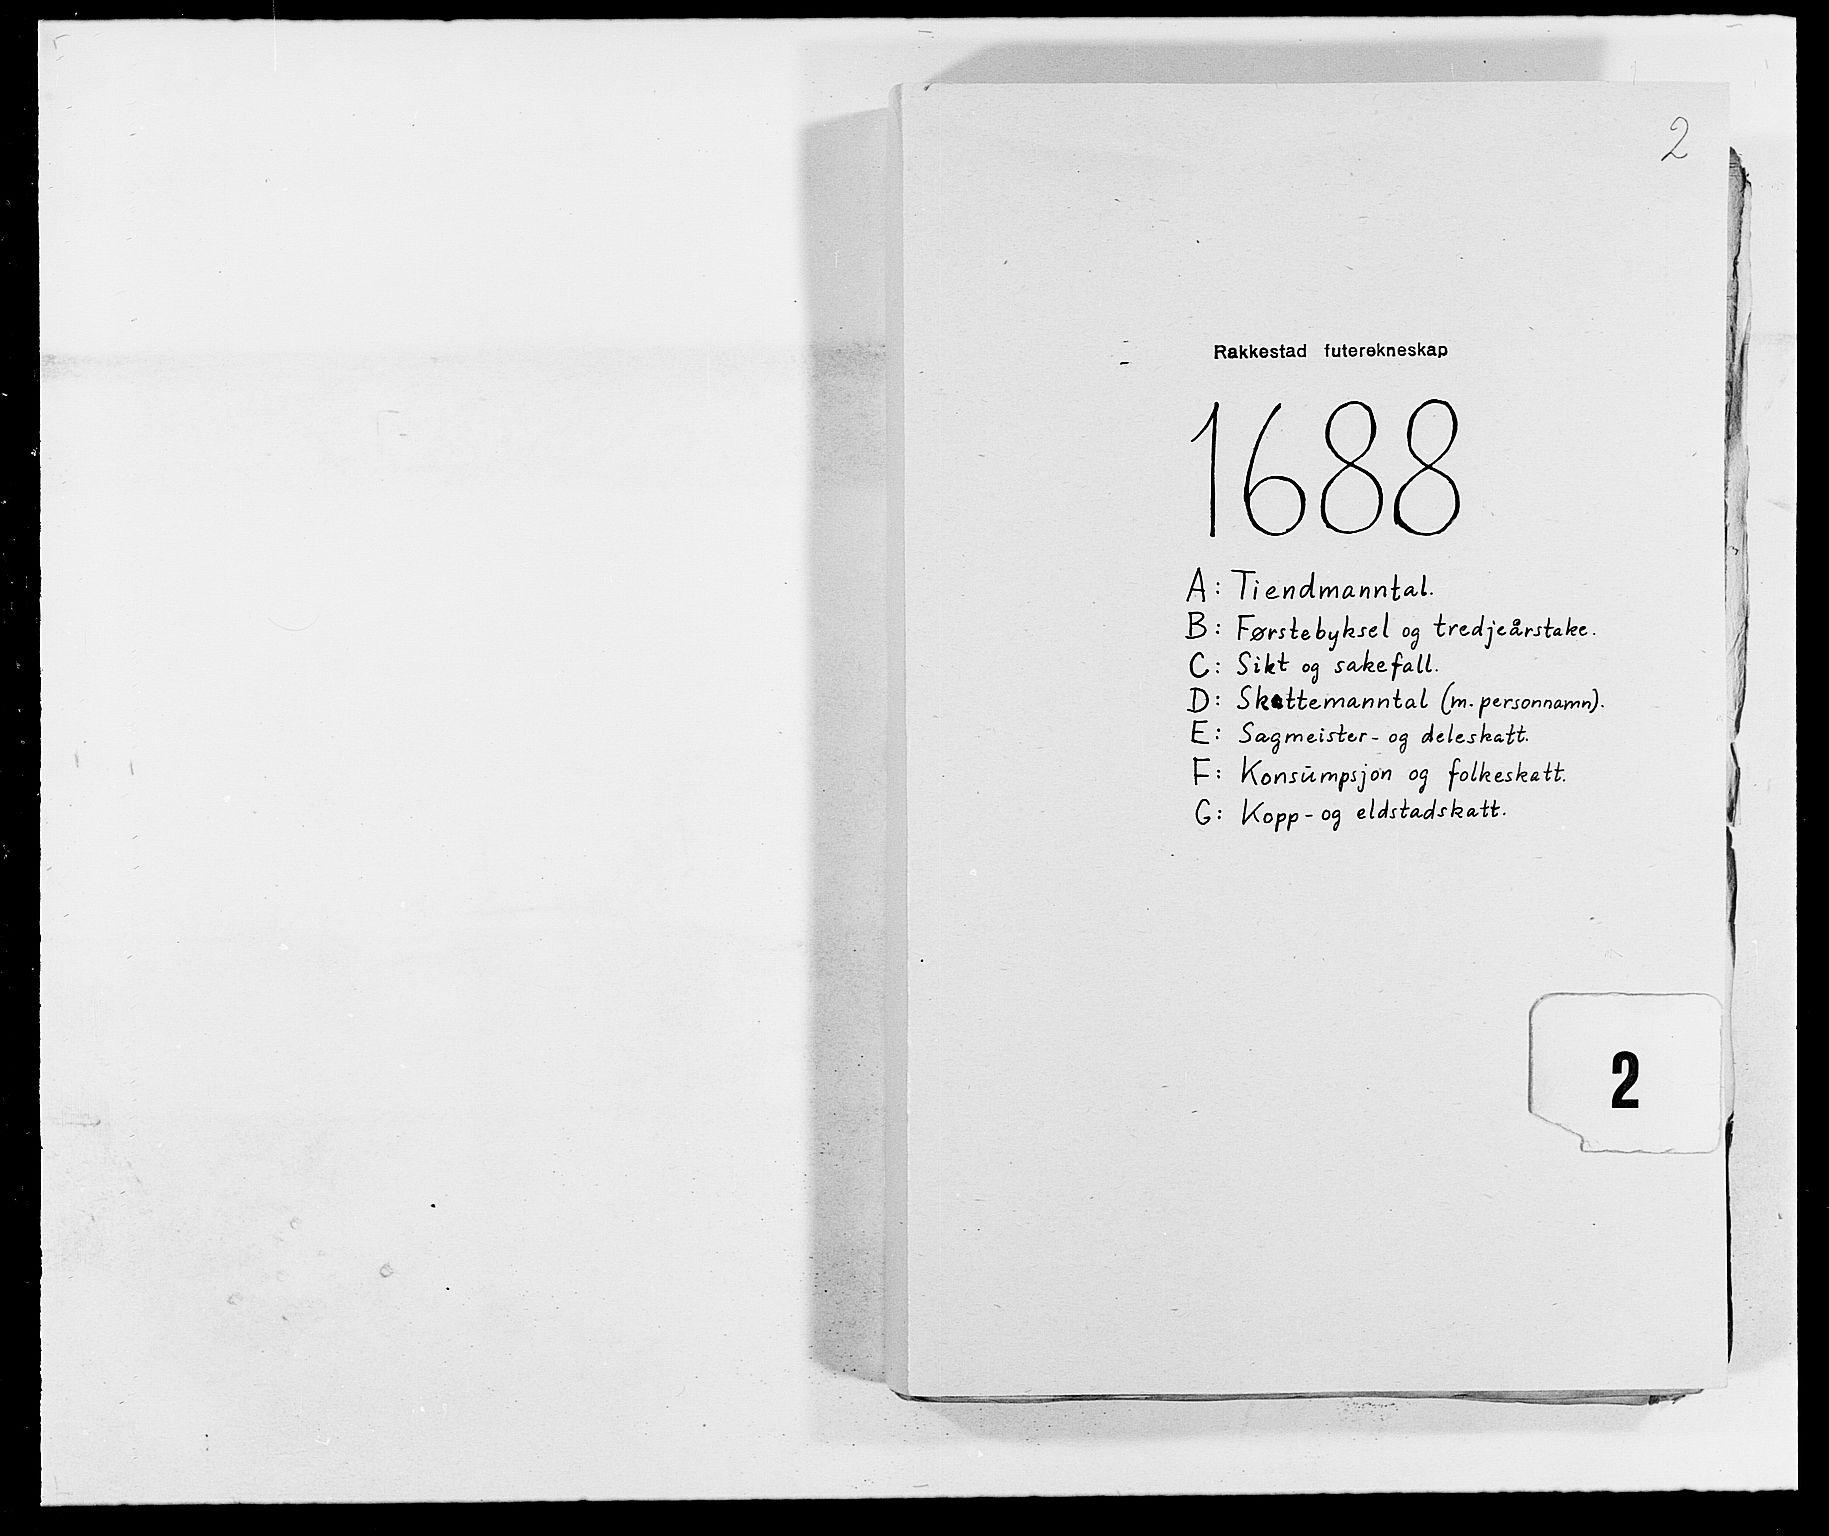 RA, Rentekammeret inntil 1814, Reviderte regnskaper, Fogderegnskap, R05/L0276: Fogderegnskap Rakkestad, 1683-1688, s. 103